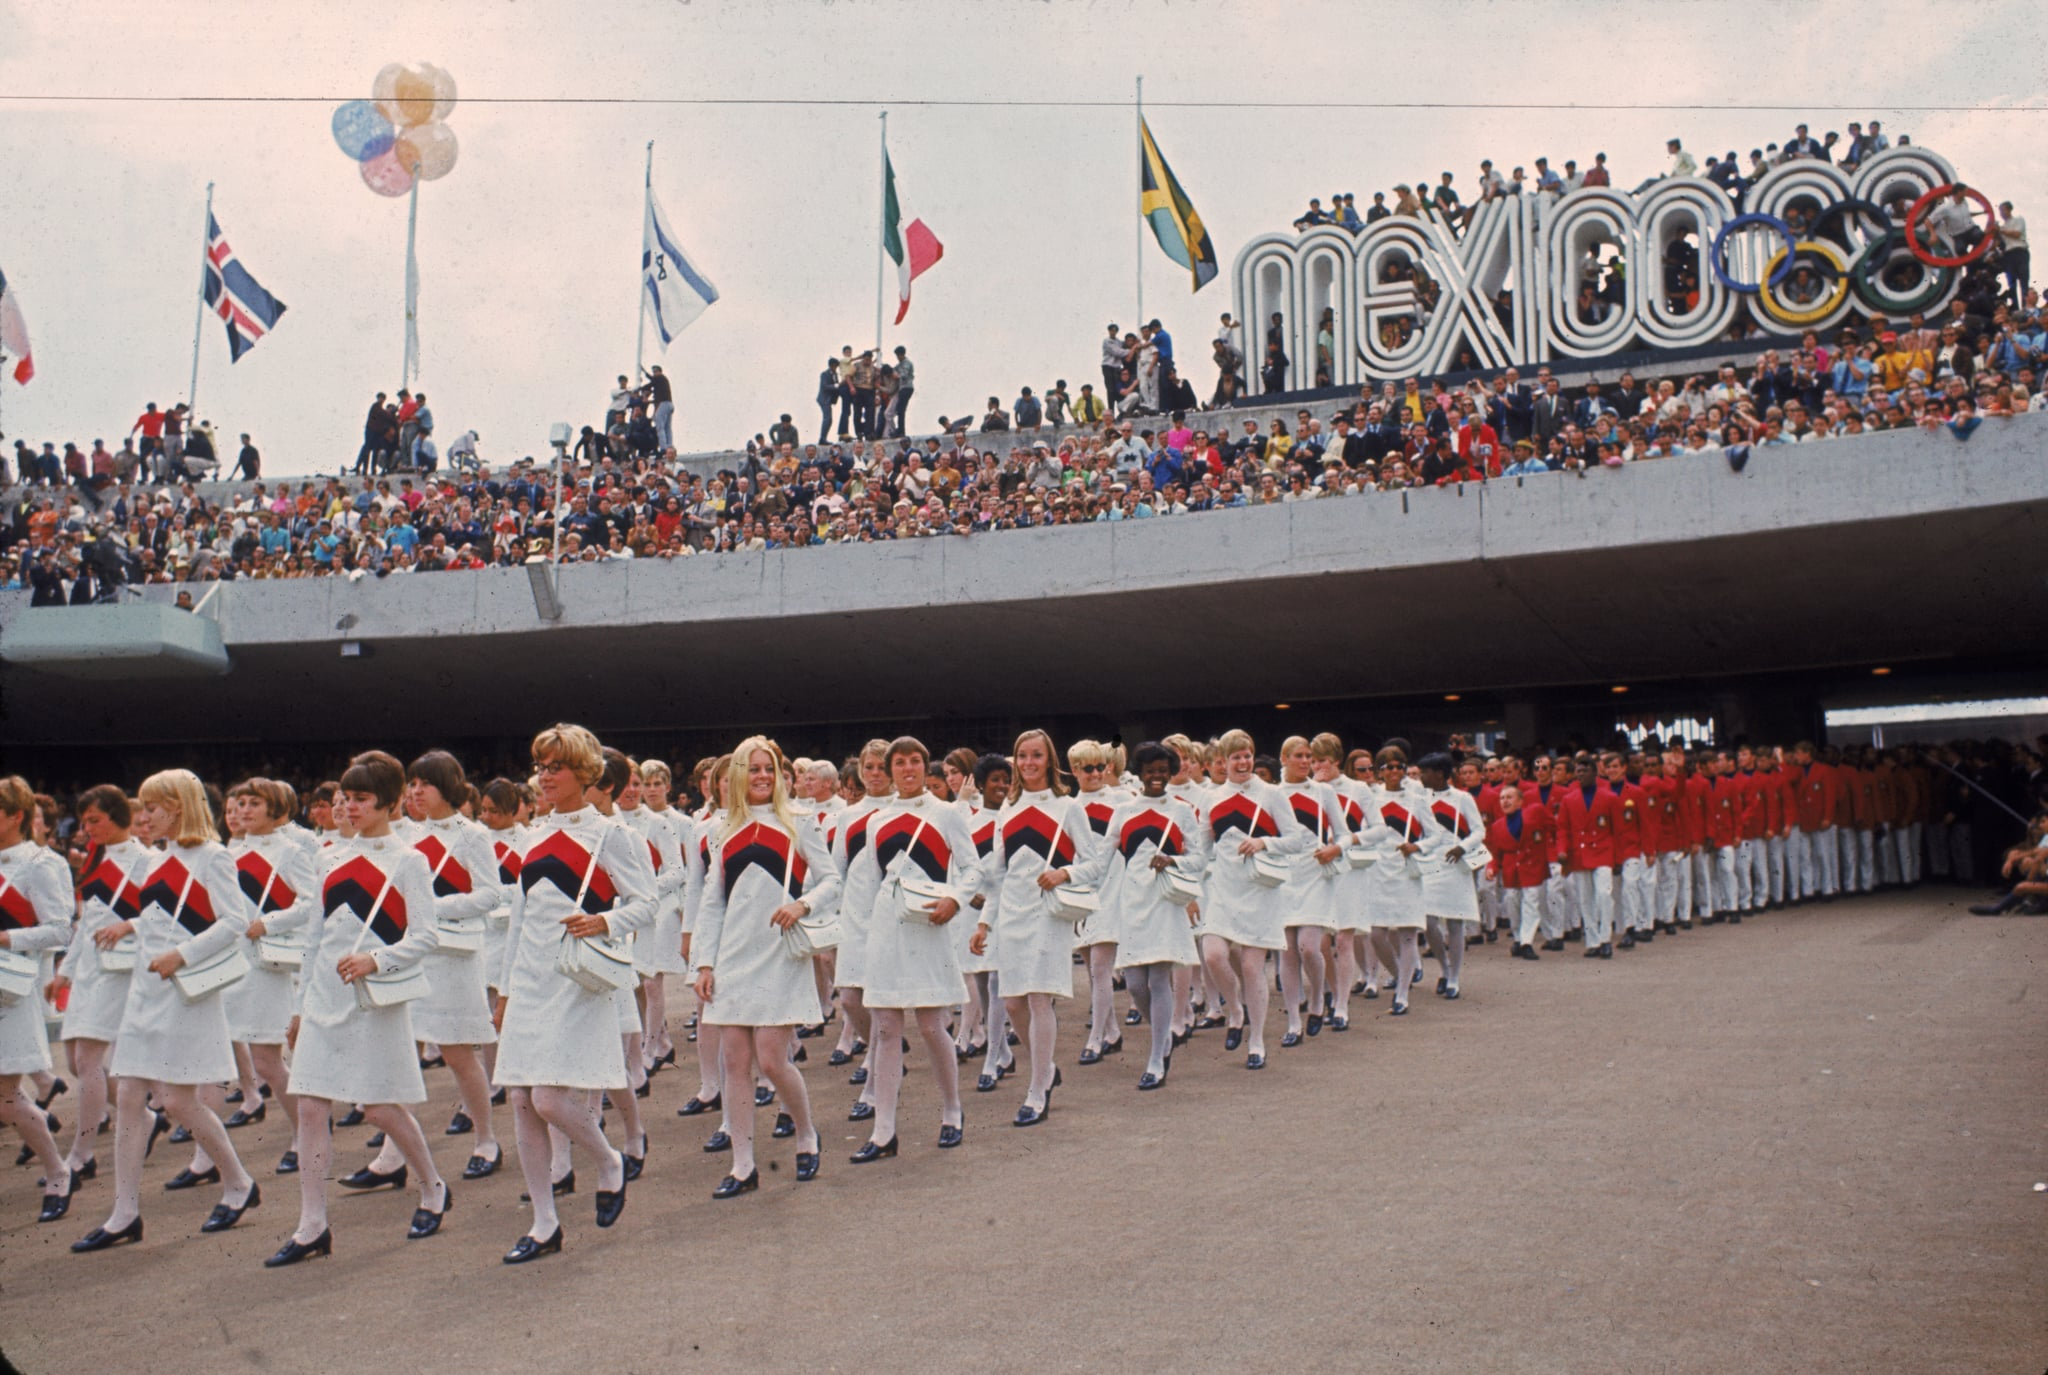 Team USA at the 1968 Olympics